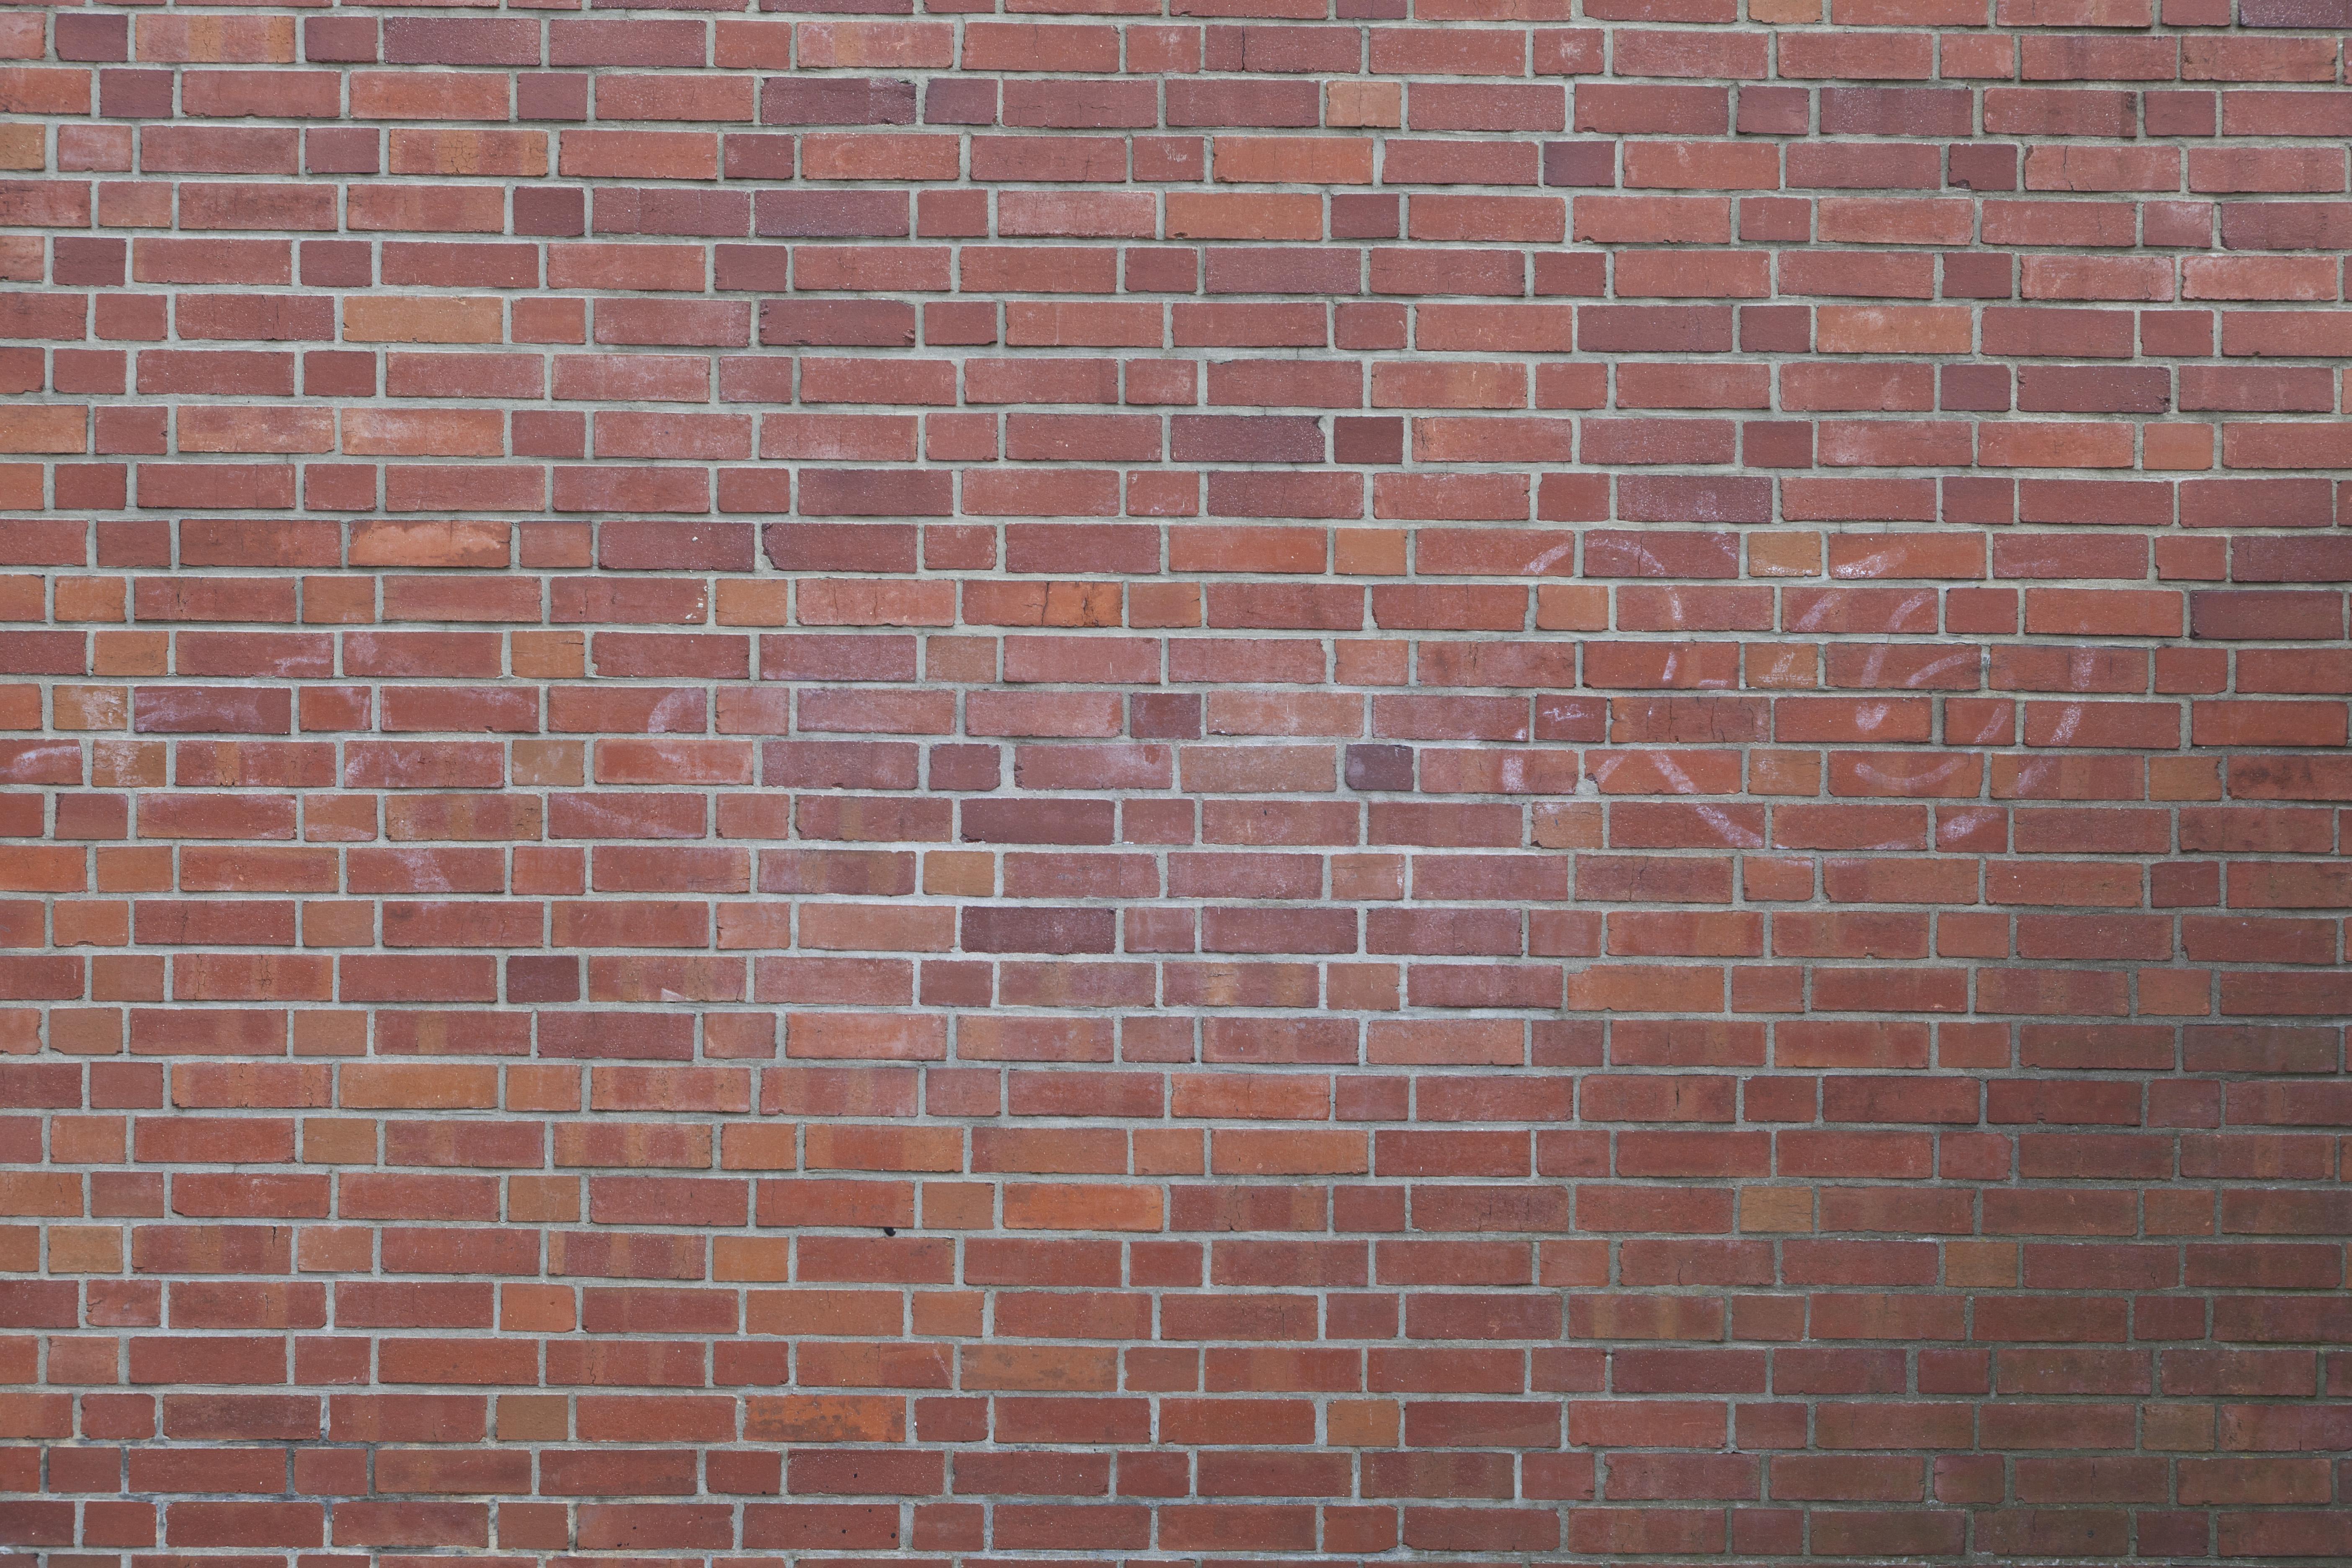 Wall Texture by pixelmixtur-stocks on DeviantArt